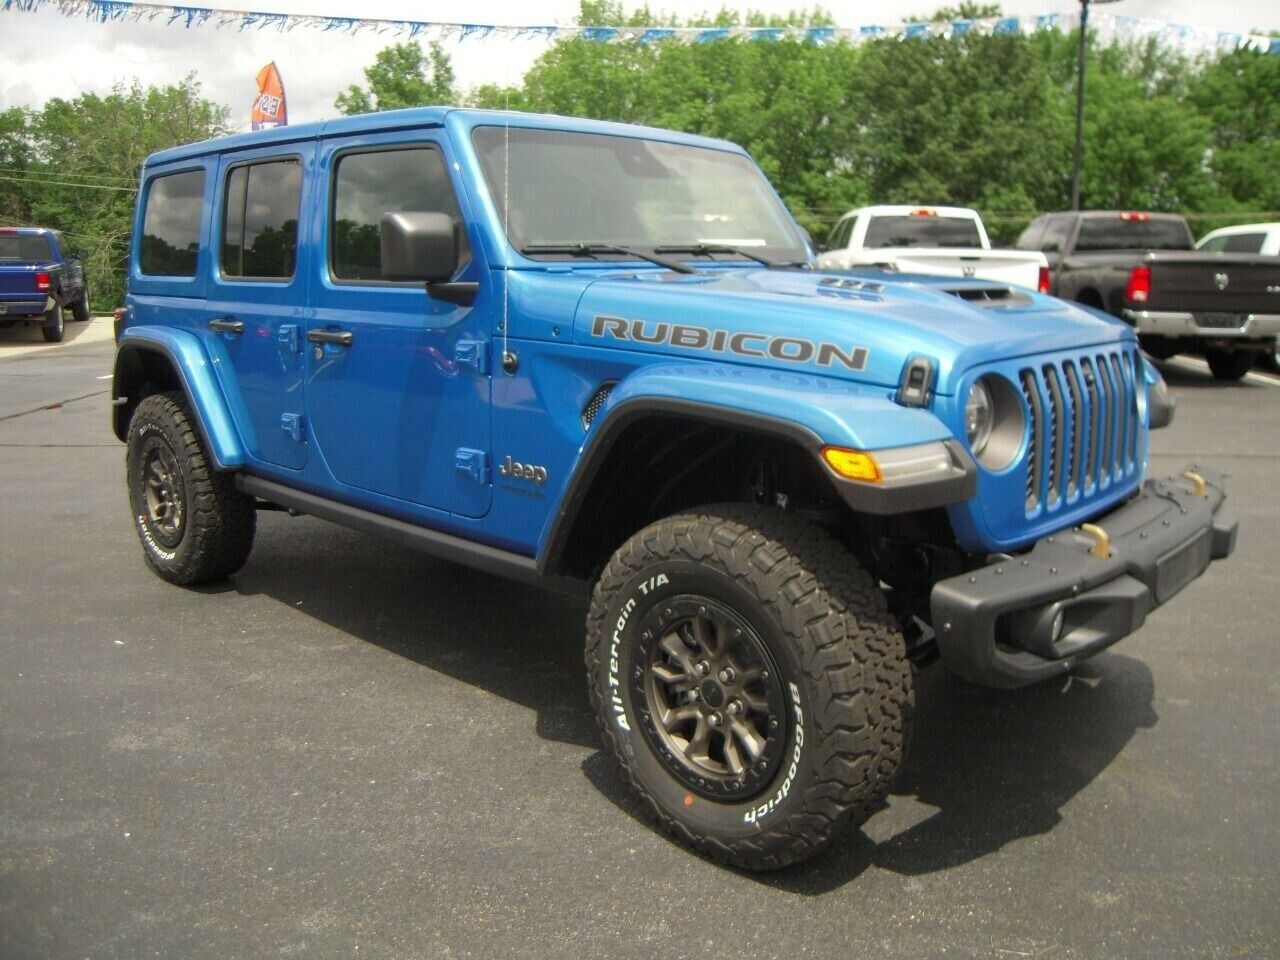 2021 Jeep Wrangler Rubicon 392 4x4 4dr SUV